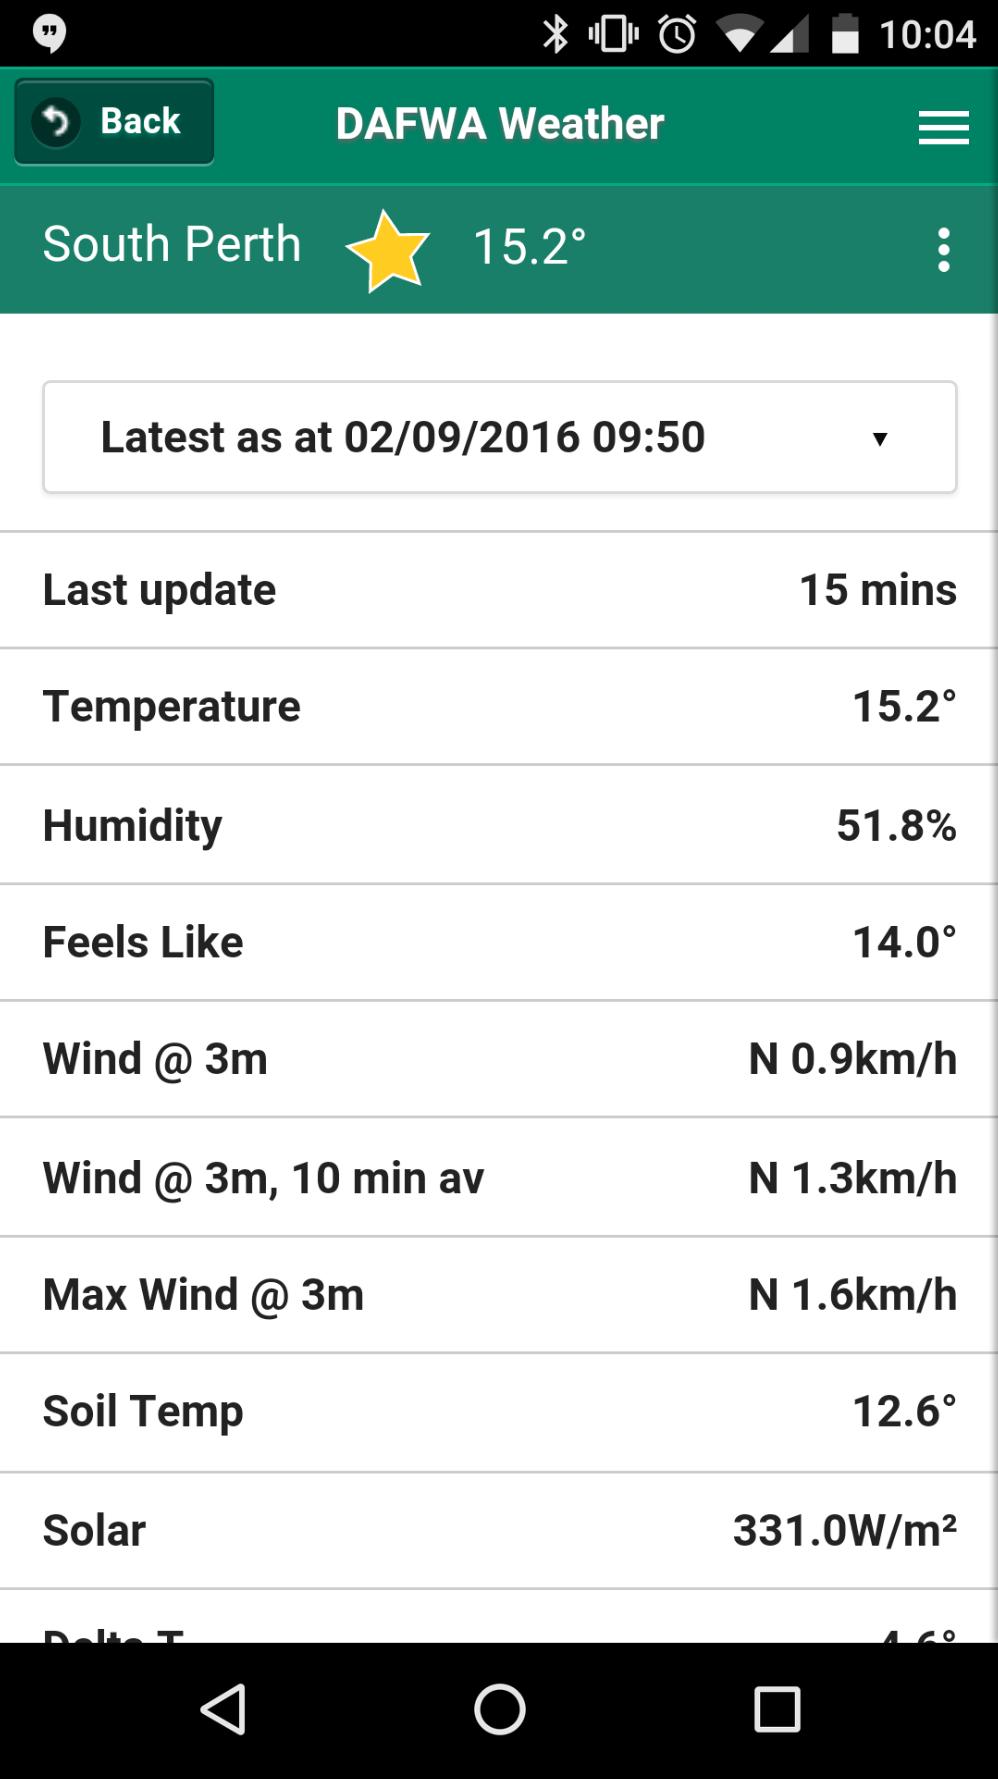 DAFWA Weather App